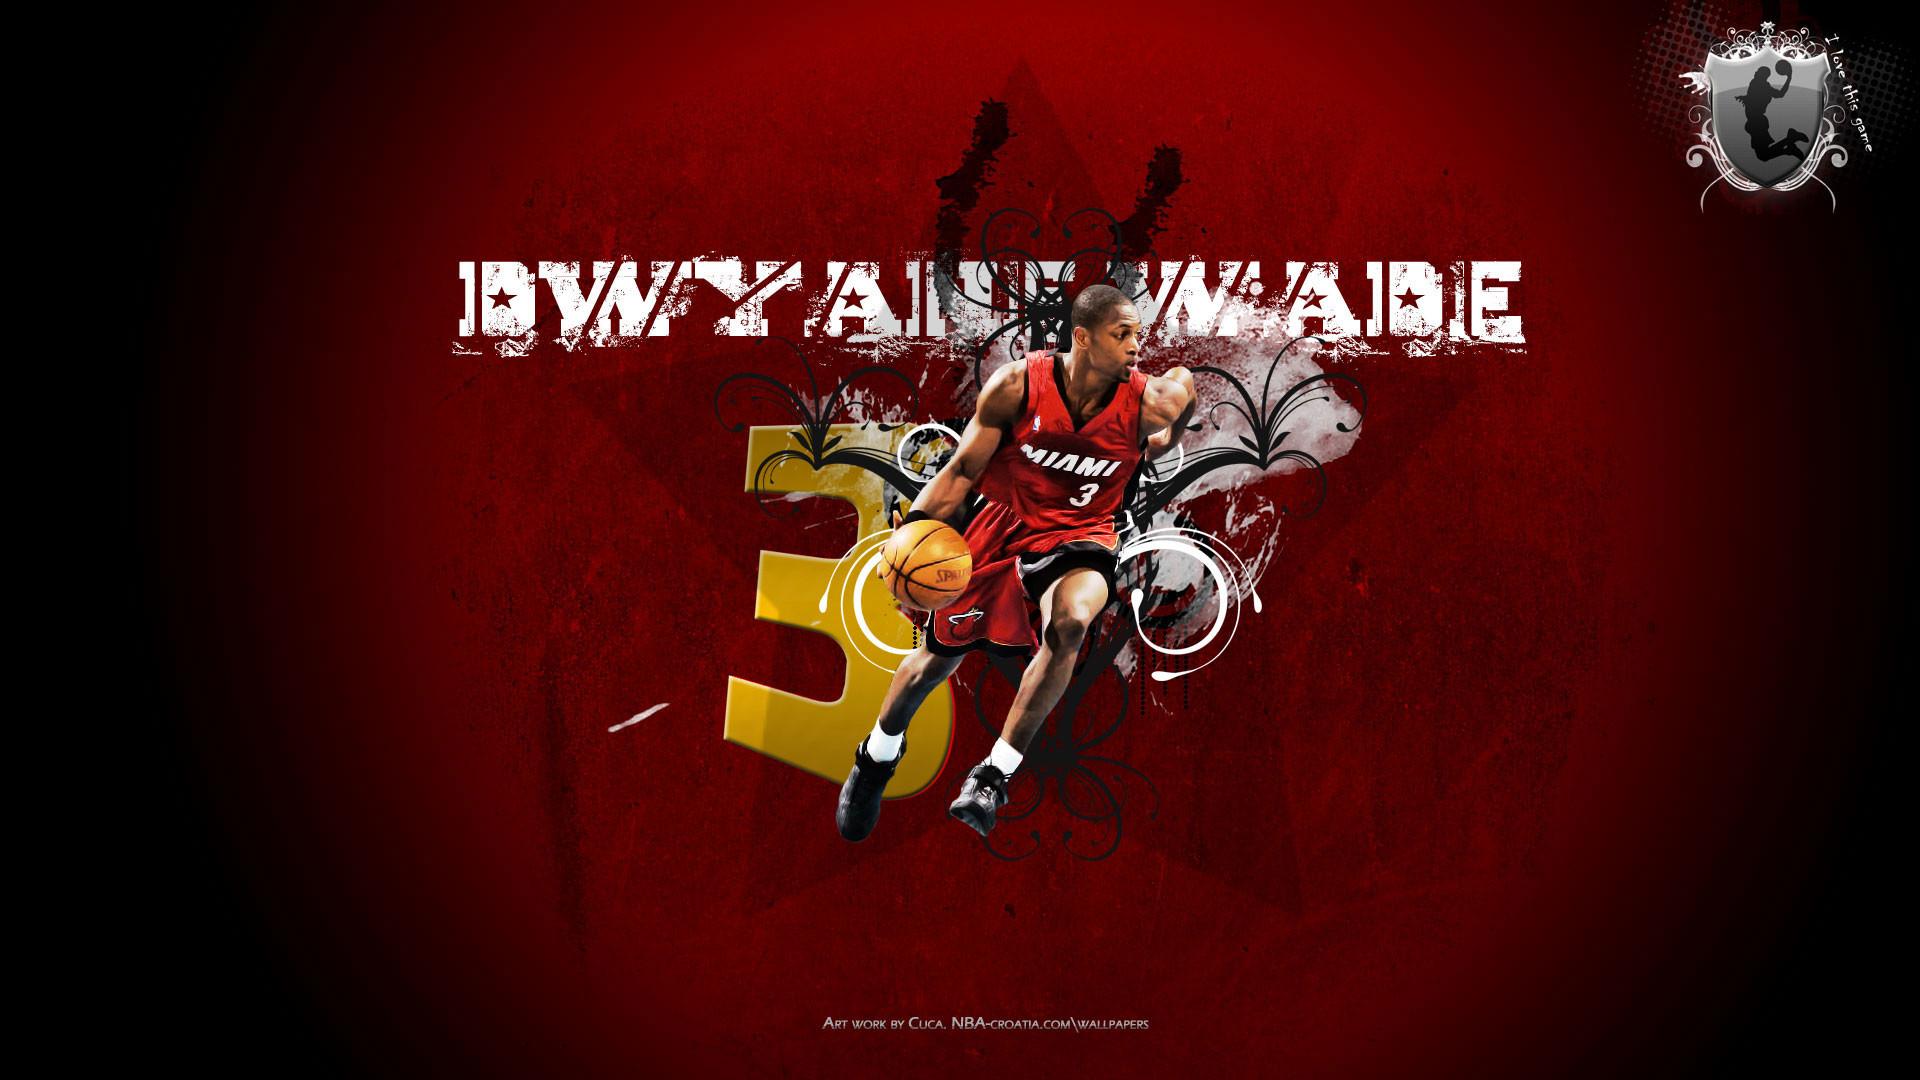 DWade Miami Heat Wallpaper Basketball Wallpapers at | HD Wallpapers |  Pinterest | Dwyane wade wallpaper, Dwyane wade and Wallpaper